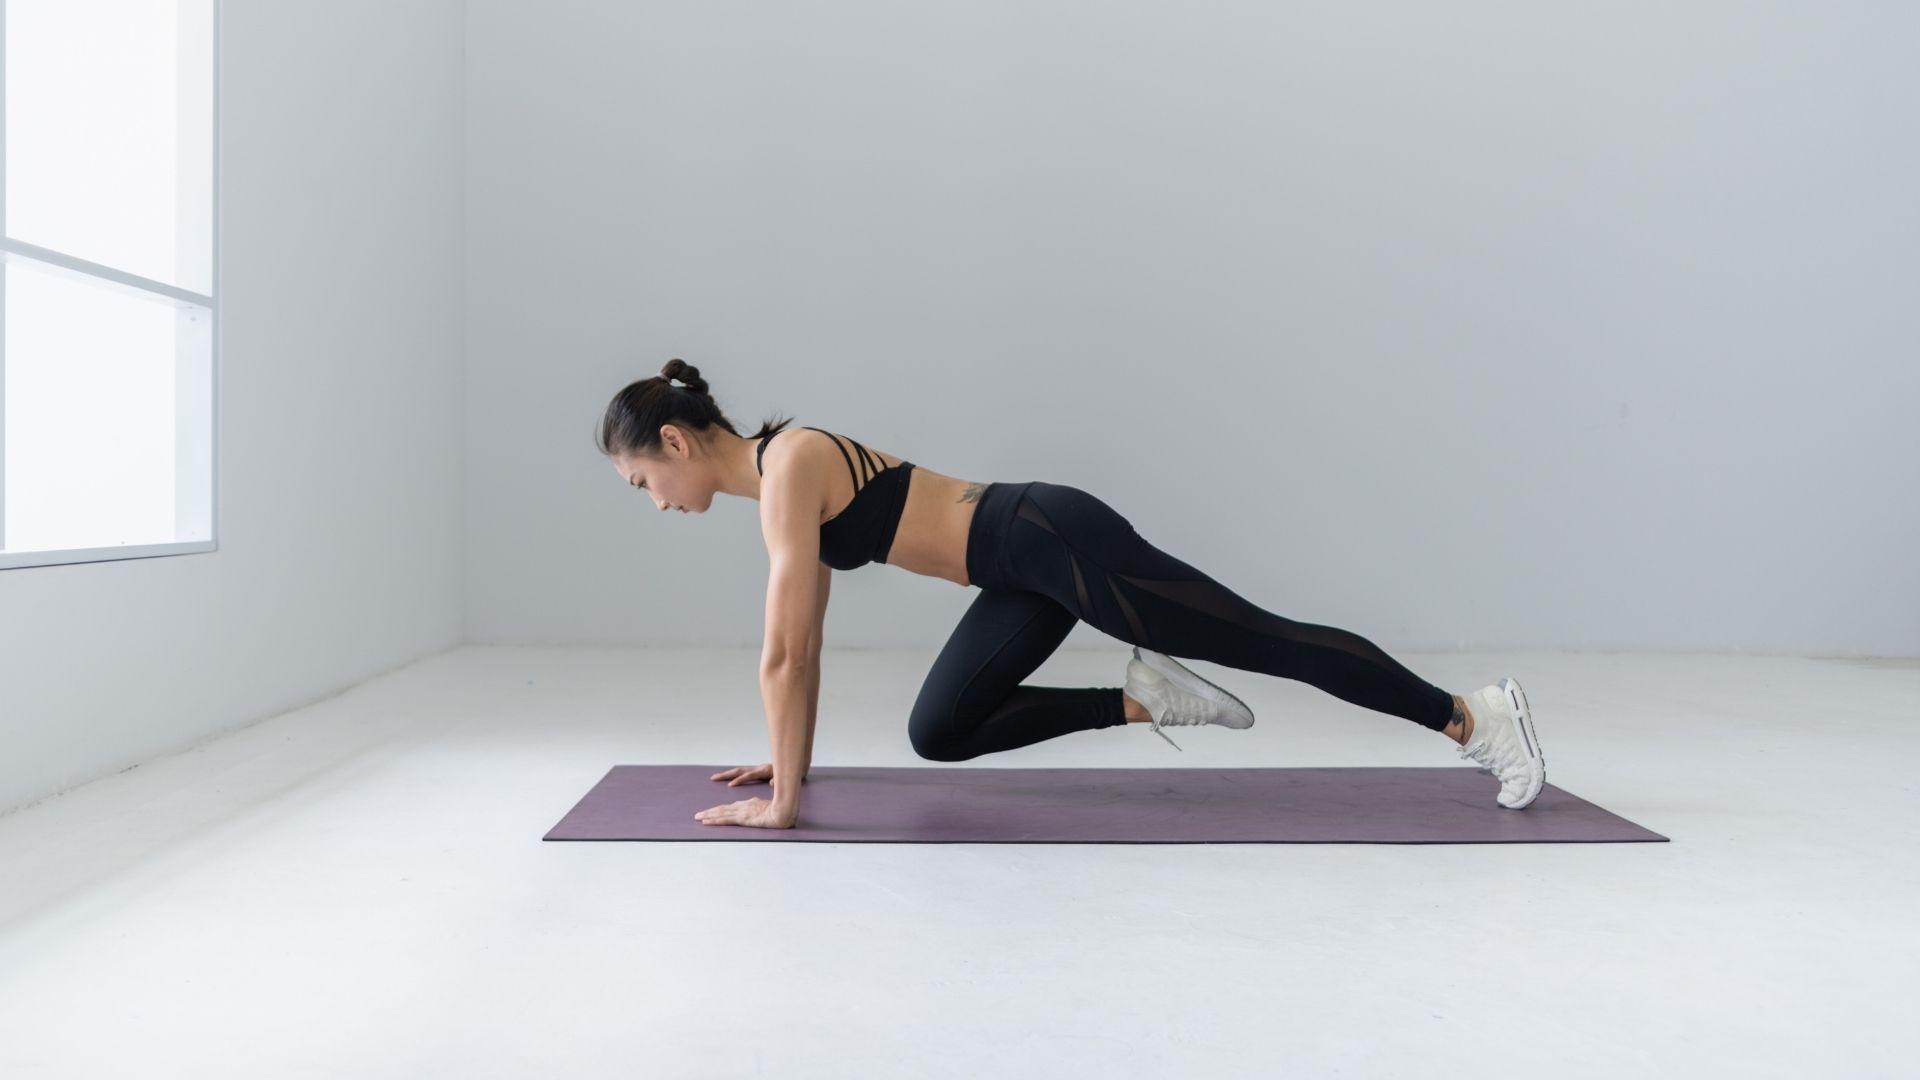 01 Bodyweight Training